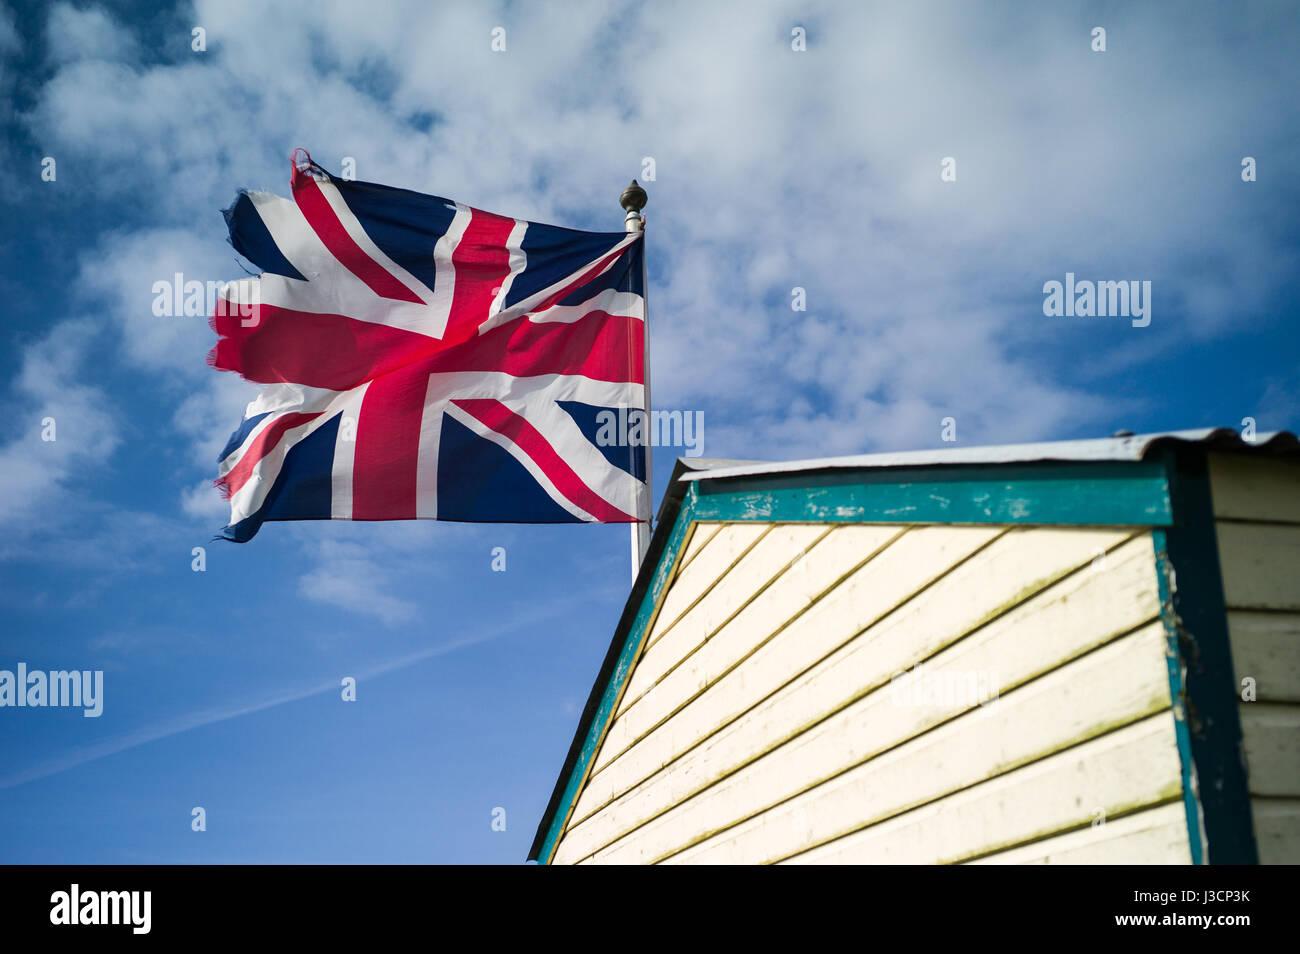 A slightly ragged Union Jack flag mounted on a seaside shed - Stock Image